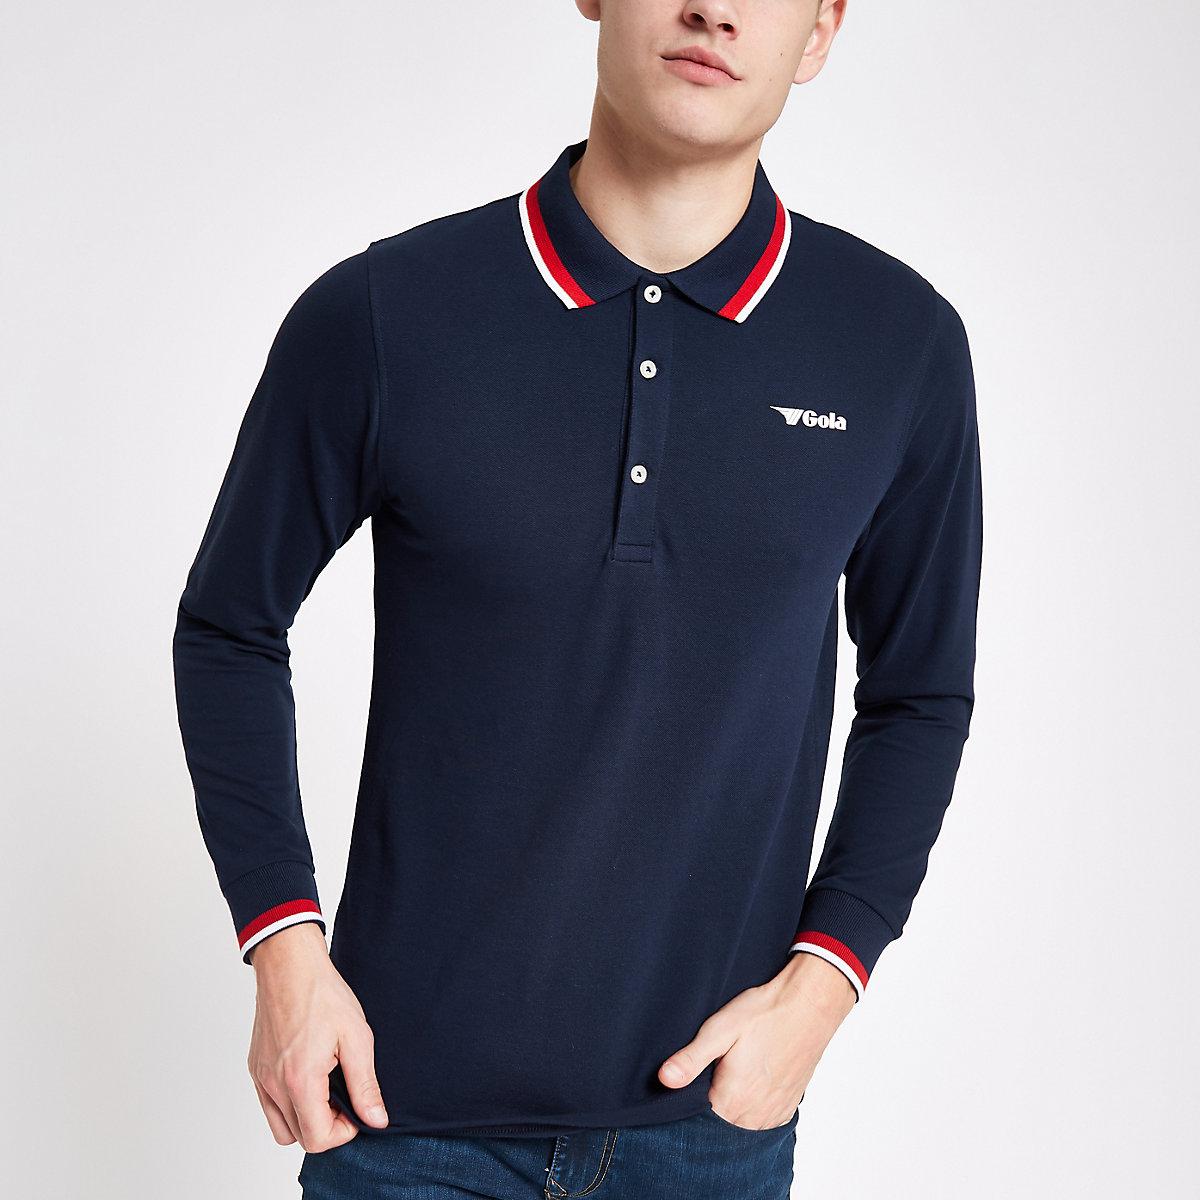 Gola navy tipped long sleeve polo shirt